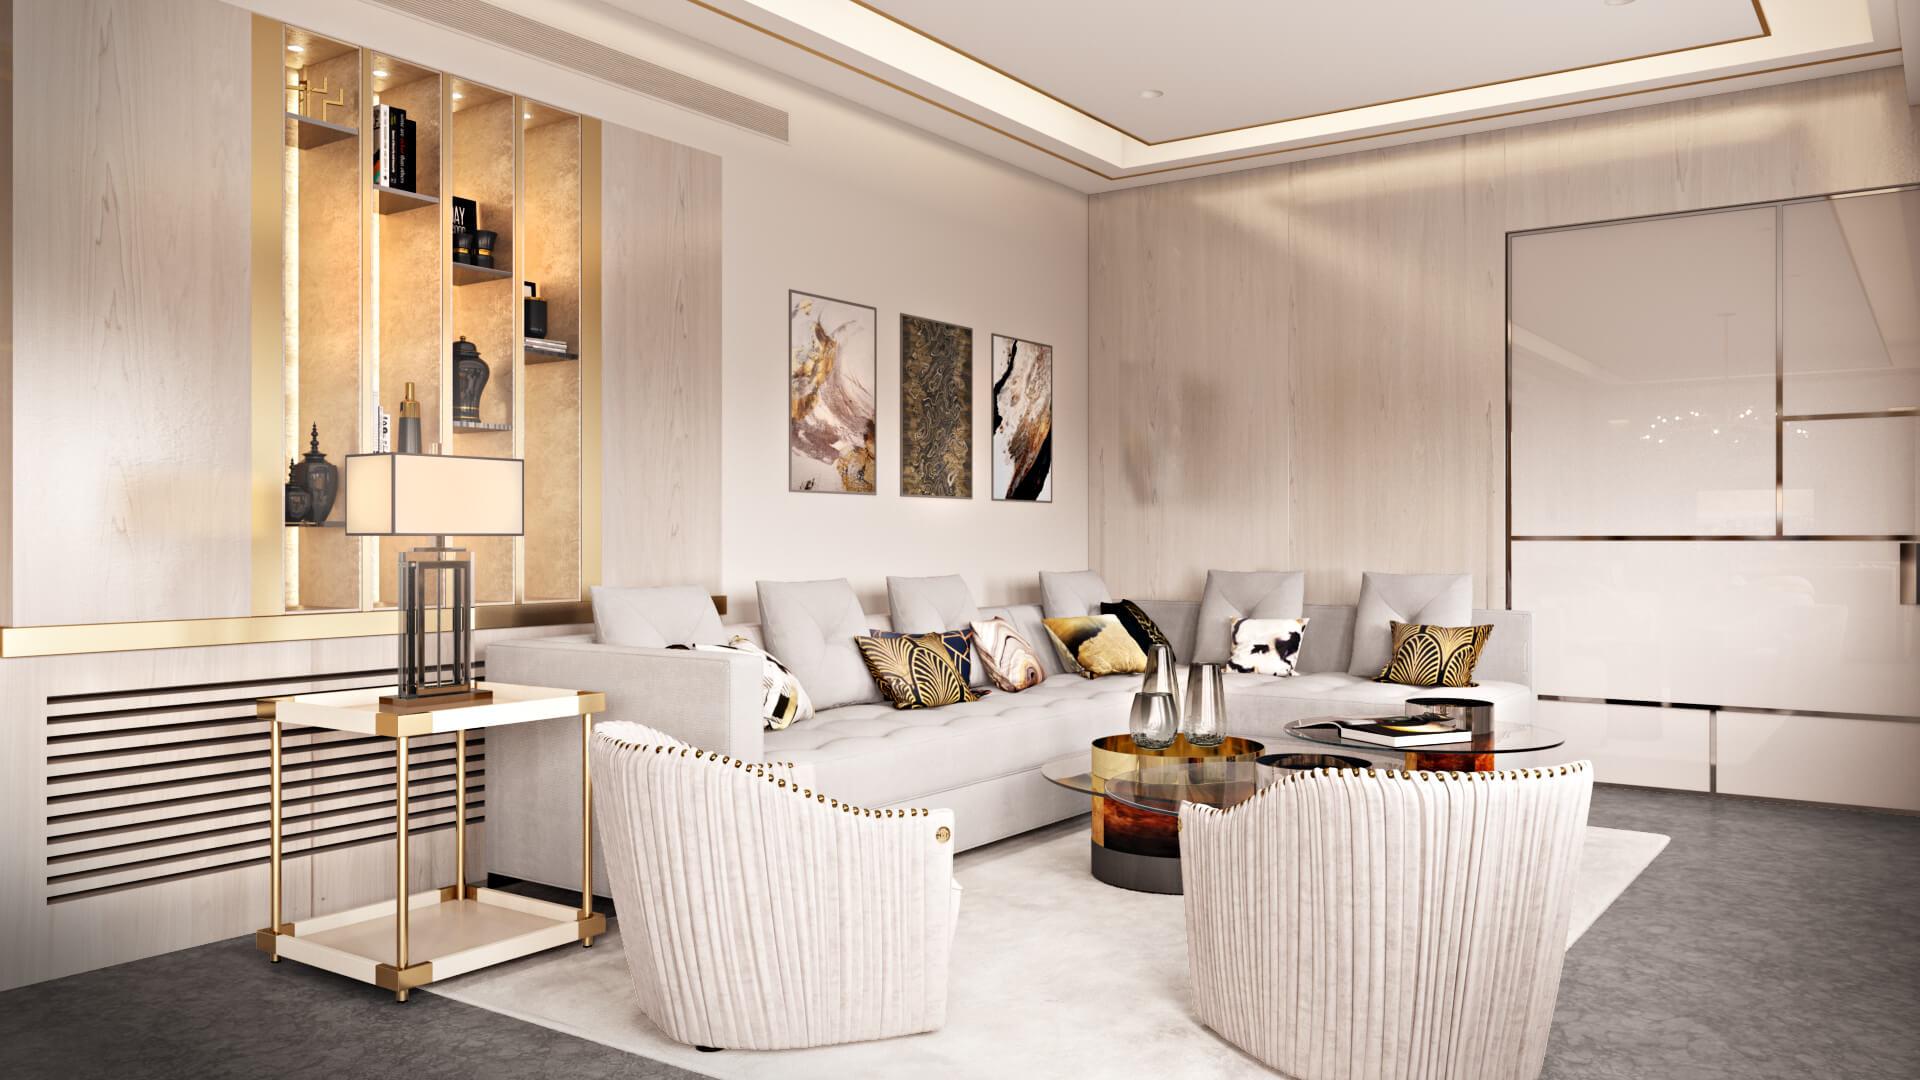 3D Visualization of an Elegant Living Room